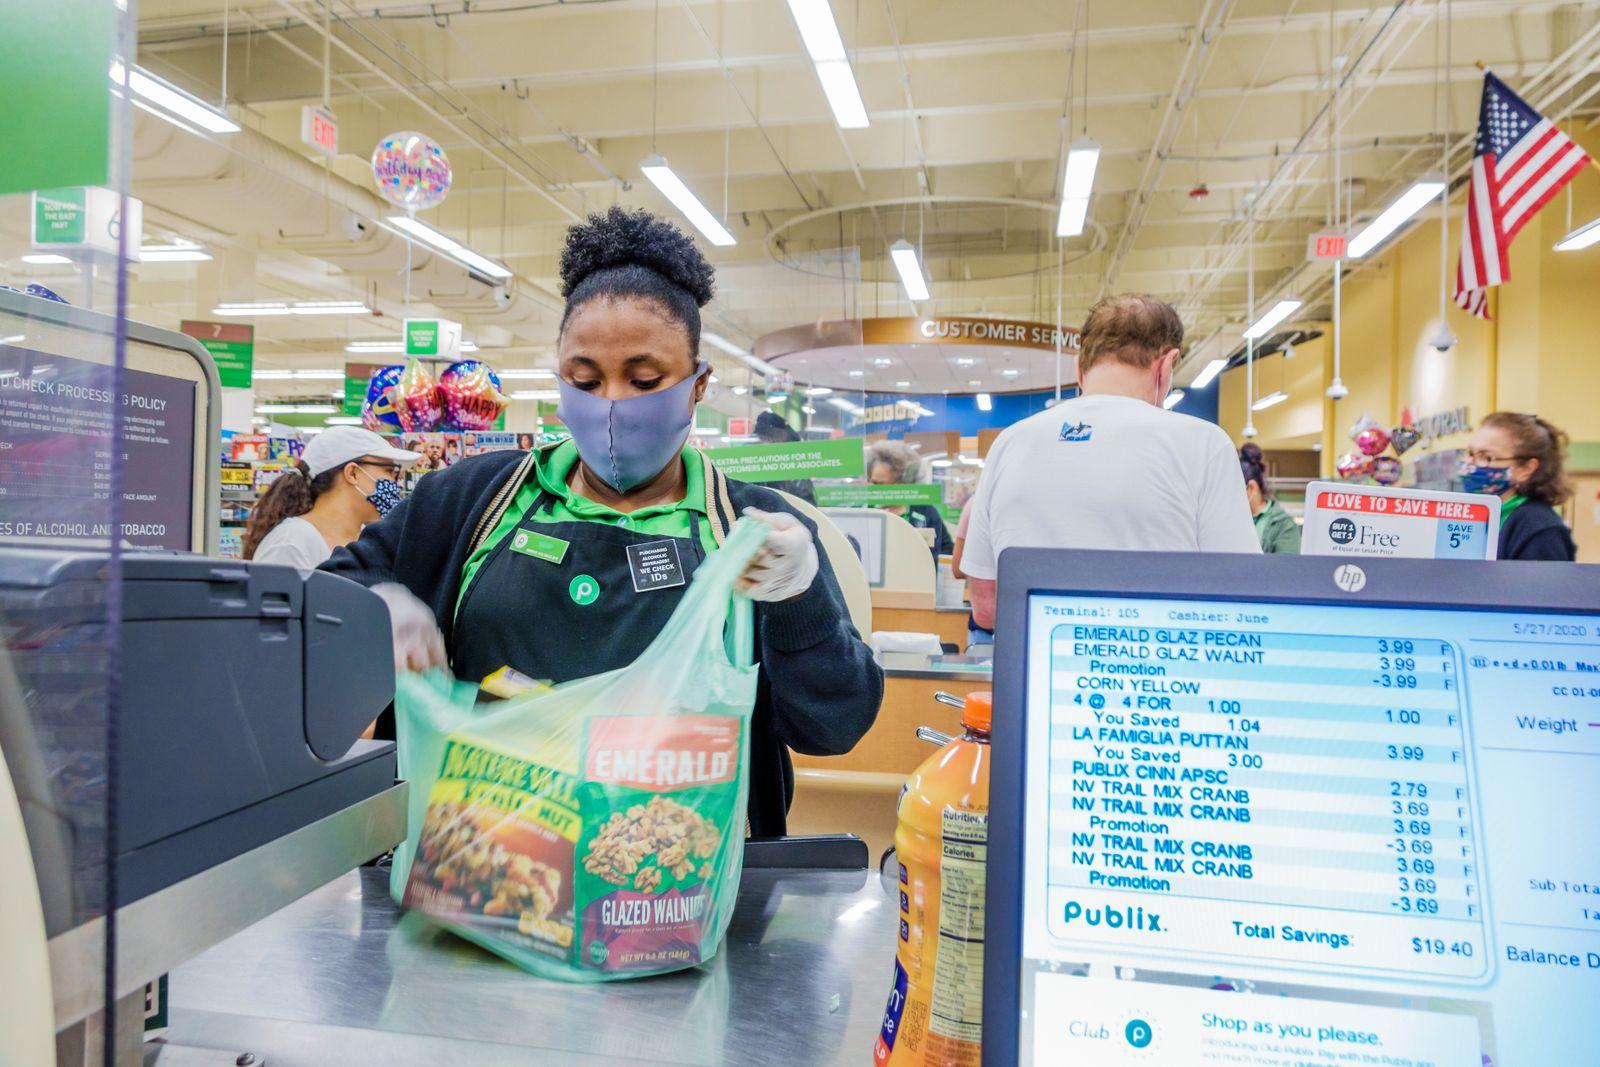 Florida, Miami Beach, Publix, supermarket check out cashier during Coronavirus Pandemic